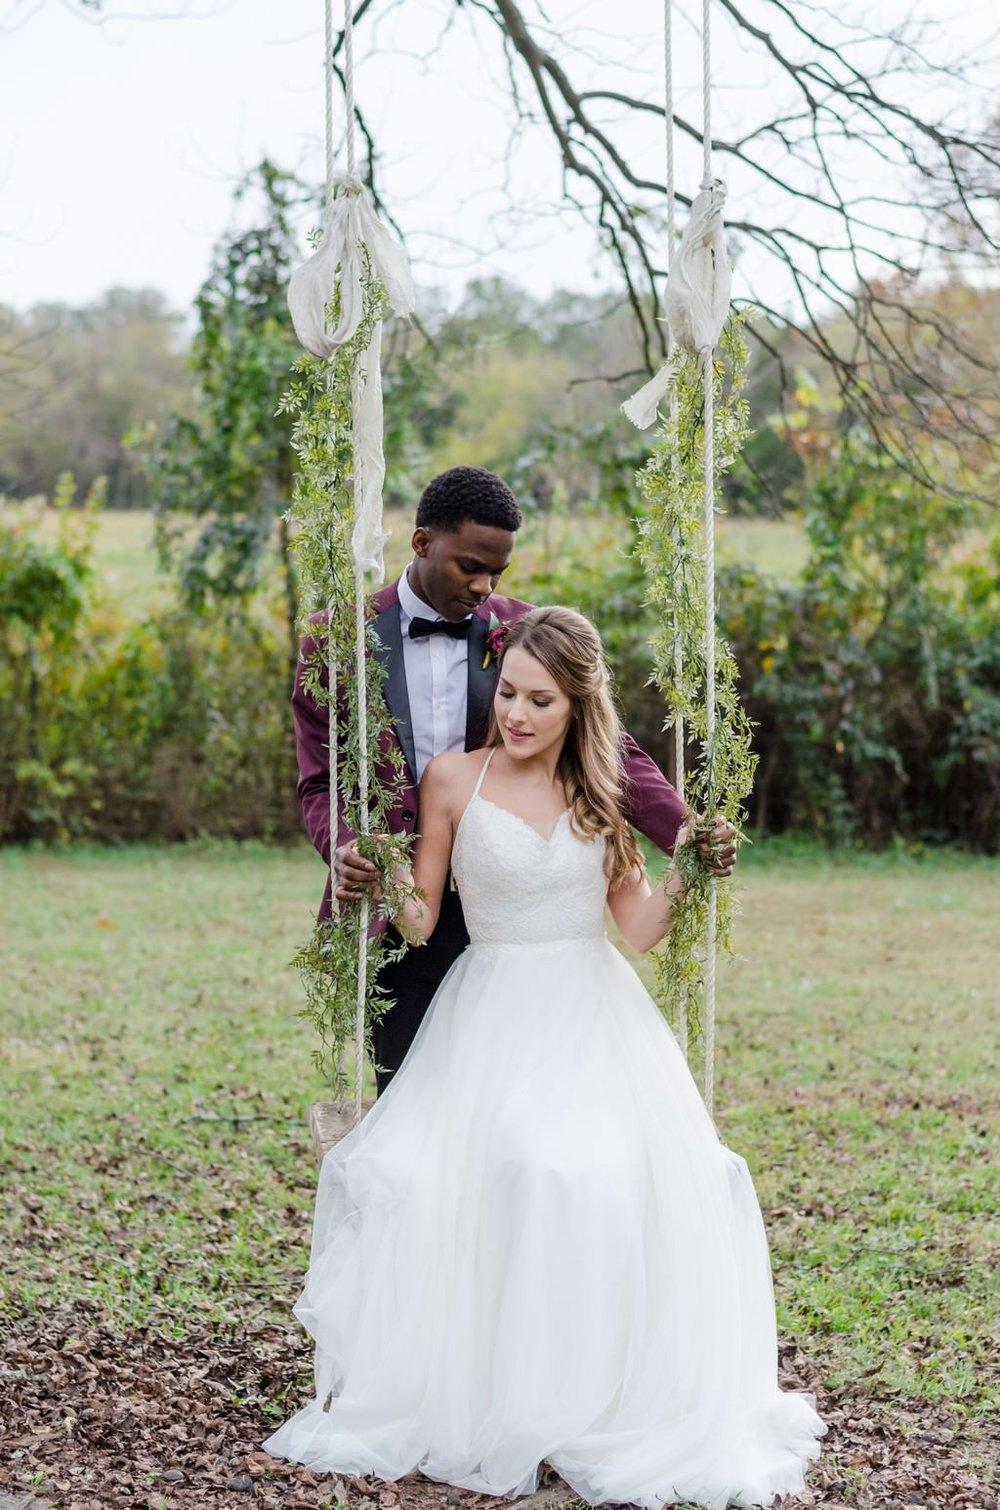 Iriswoods-Mt-Juliet-Blush-and-Burgundy-Nashville-Wedding-Photographer+5